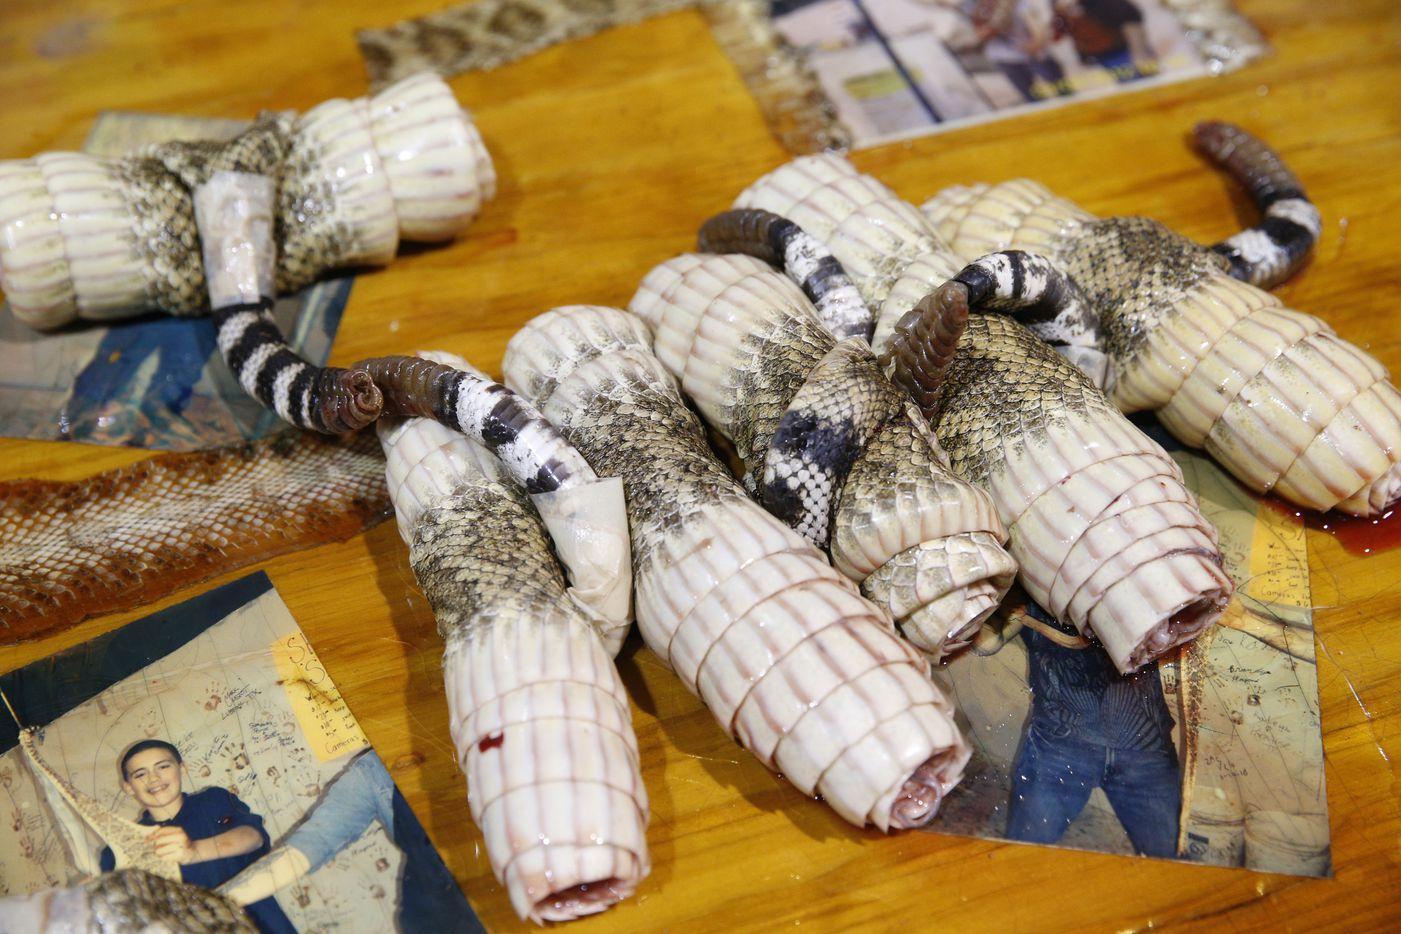 Rattlesnake skins rolled up fresh after being skinned. (Nathan Hunsinger/The Dallas Morning News)